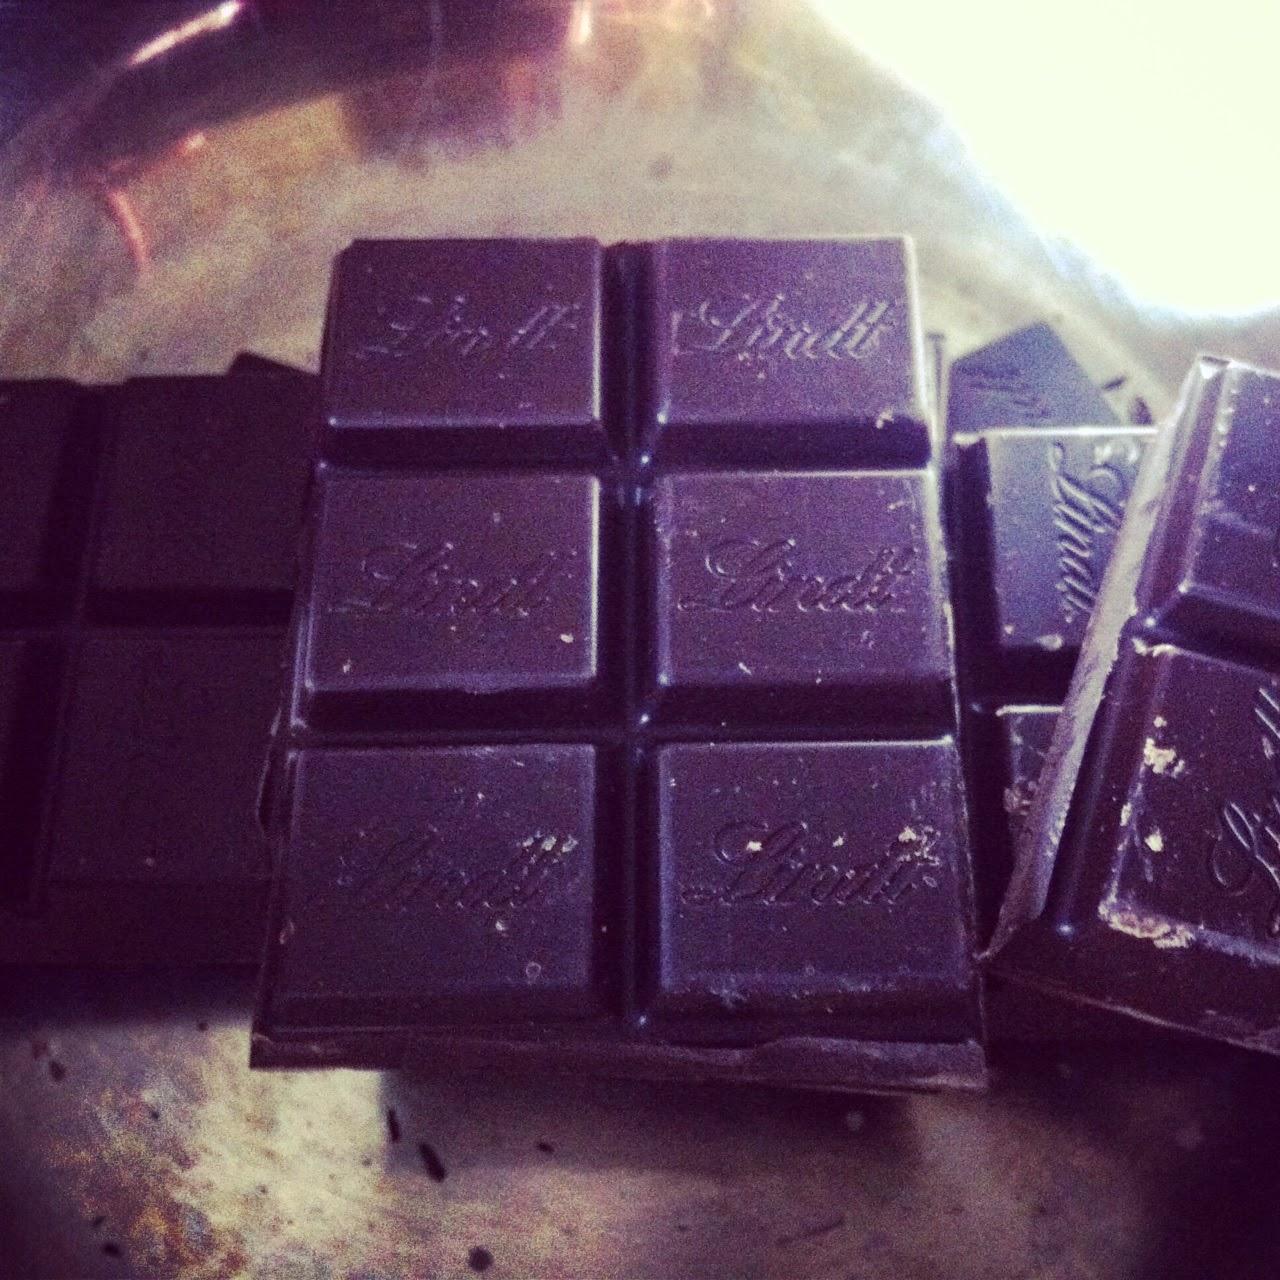 Tumbas de chocolate, derritiendo el chocolate.